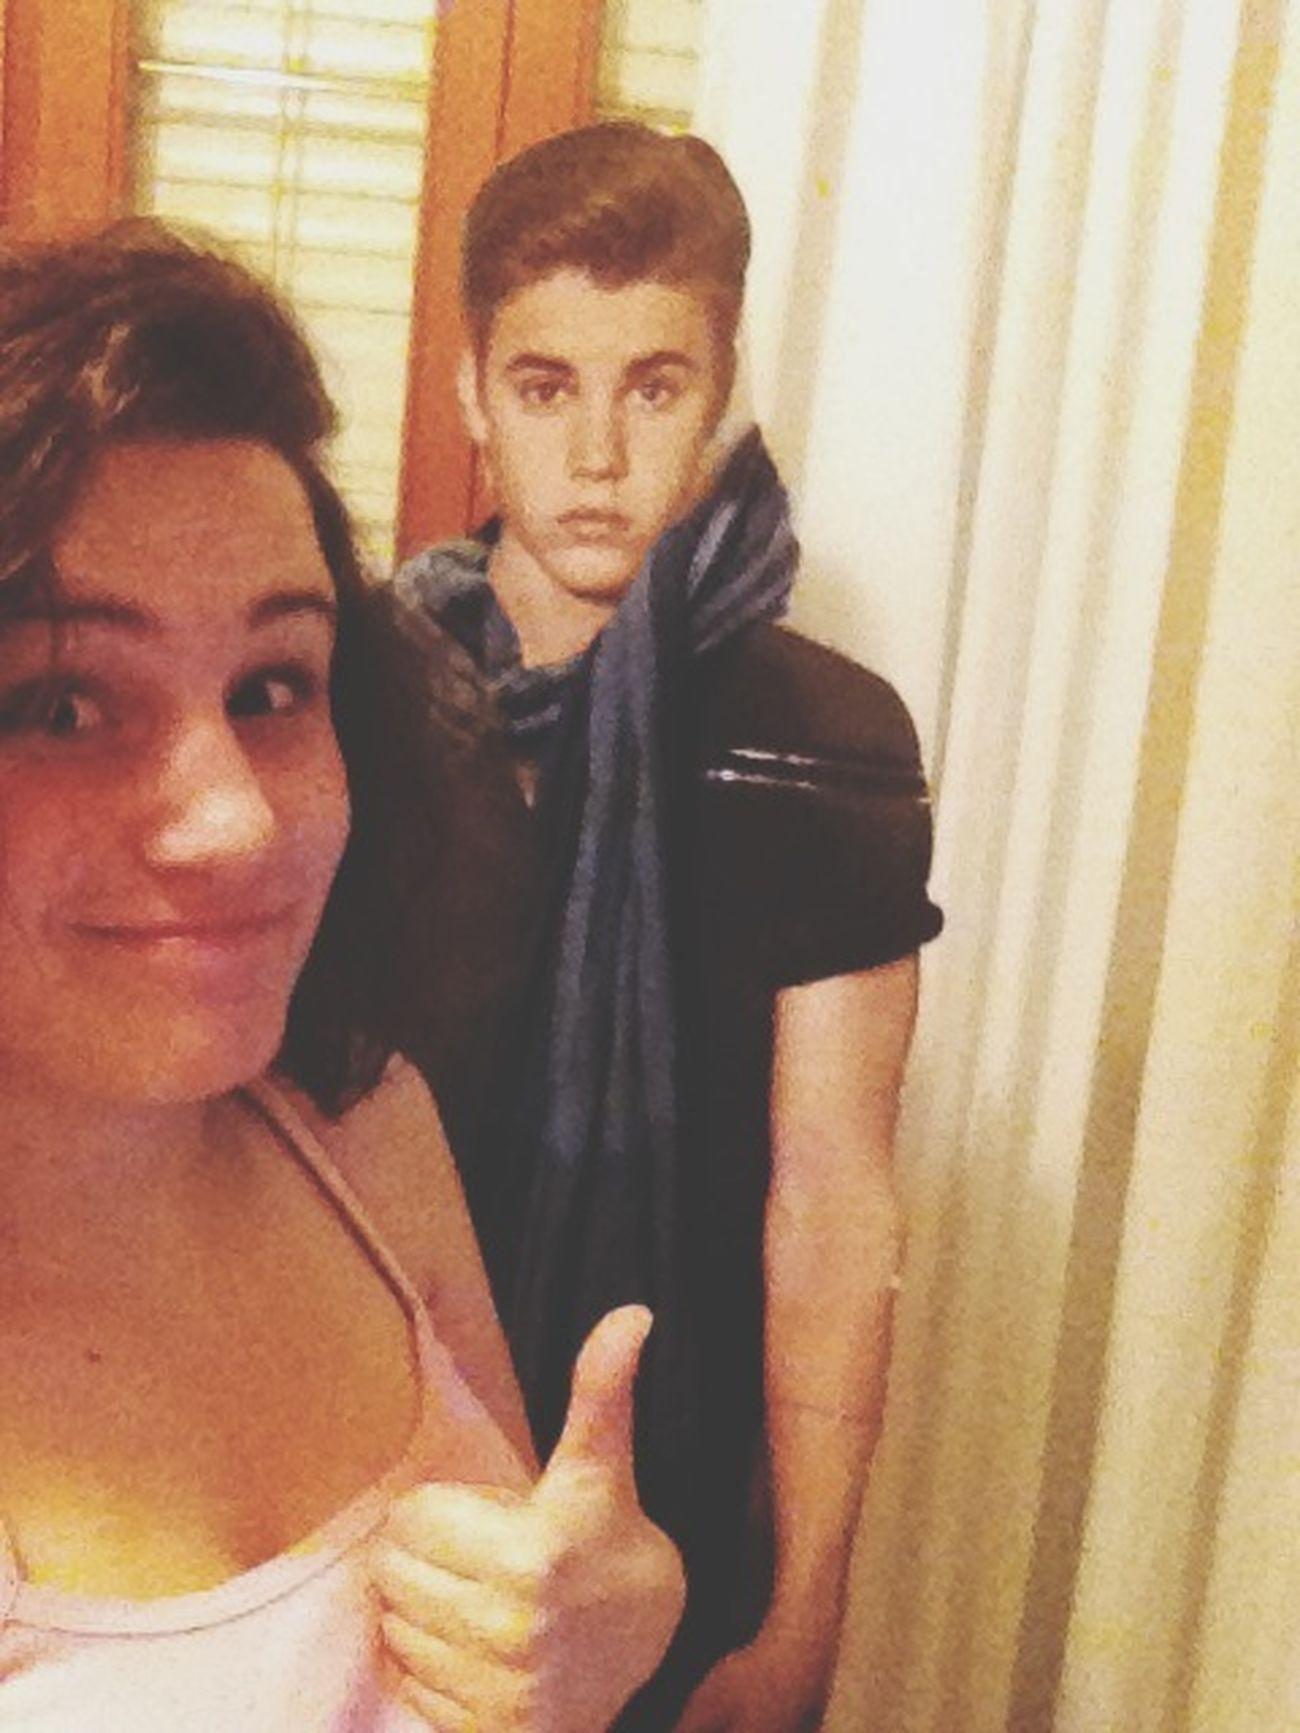 Omg Justin Bieber